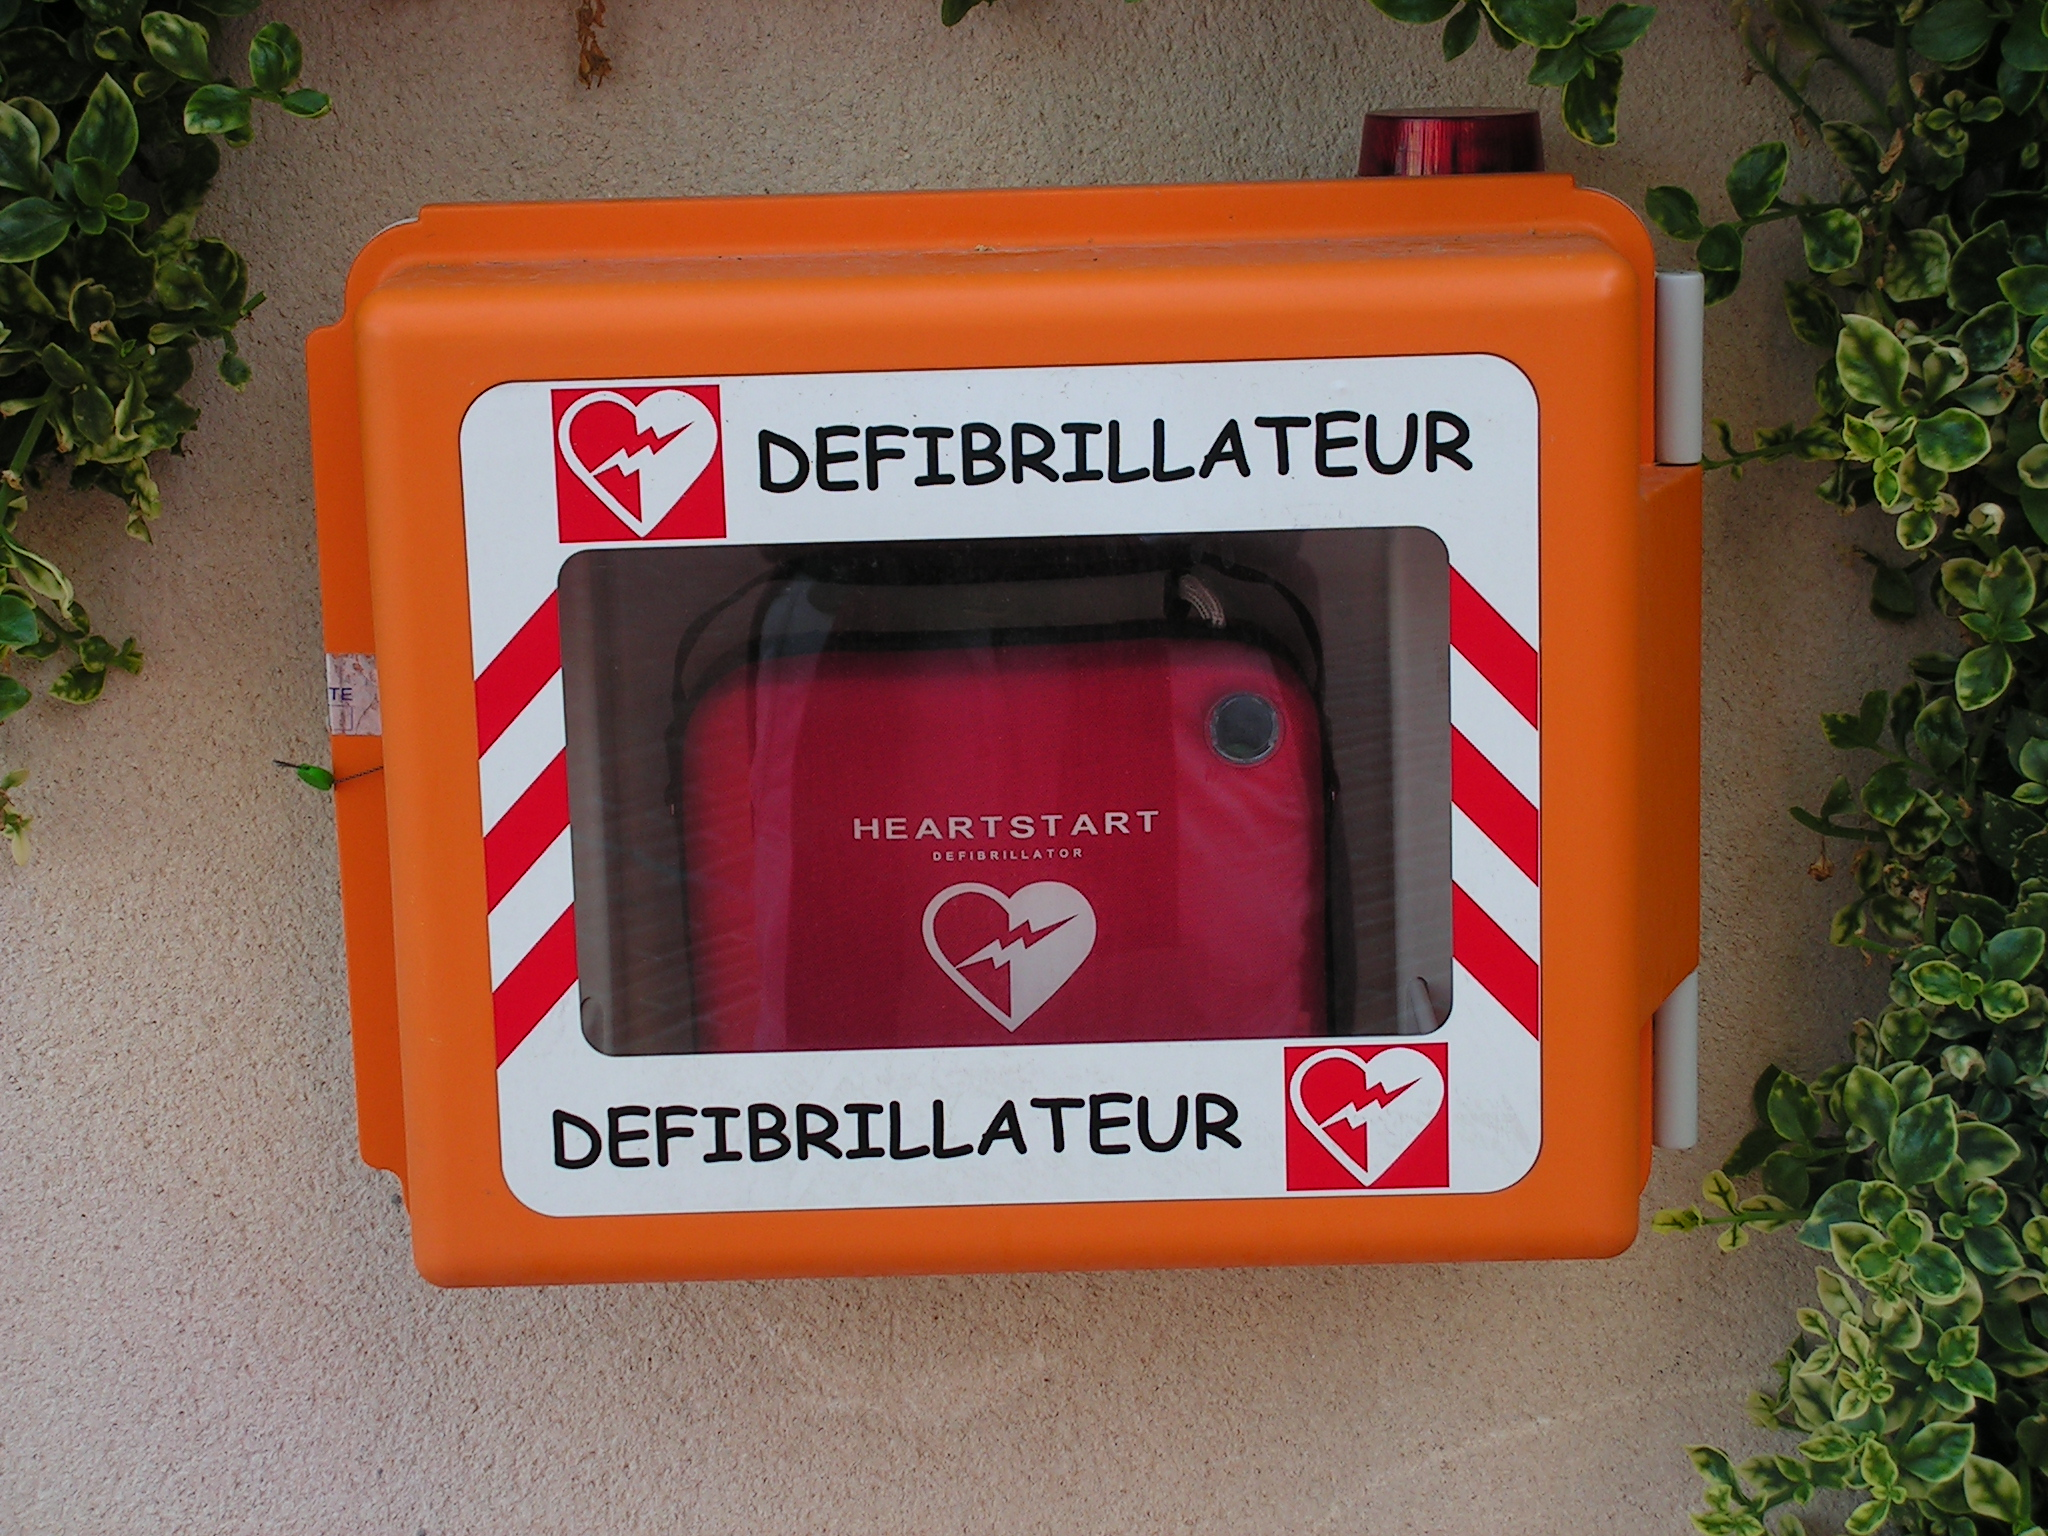 http://upload.wikimedia.org/wikipedia/commons/0/0a/Street-defibrillator.jpg